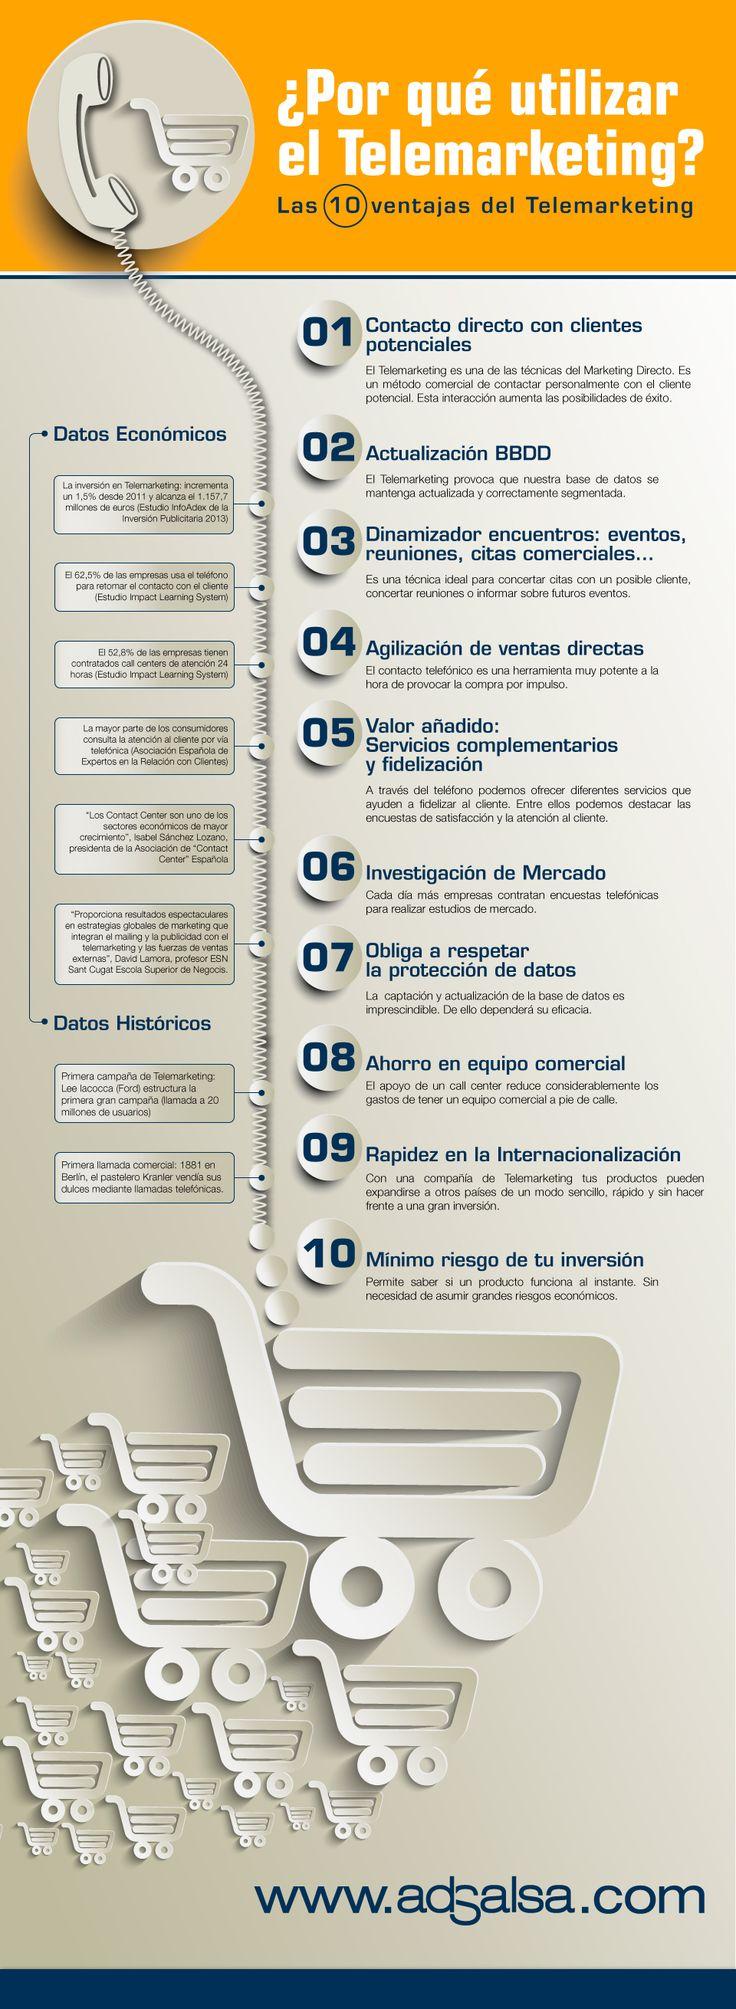 10 ventajas del Telemarketing Fuente: www.adsalsa.com #infografia #infographic #marketing